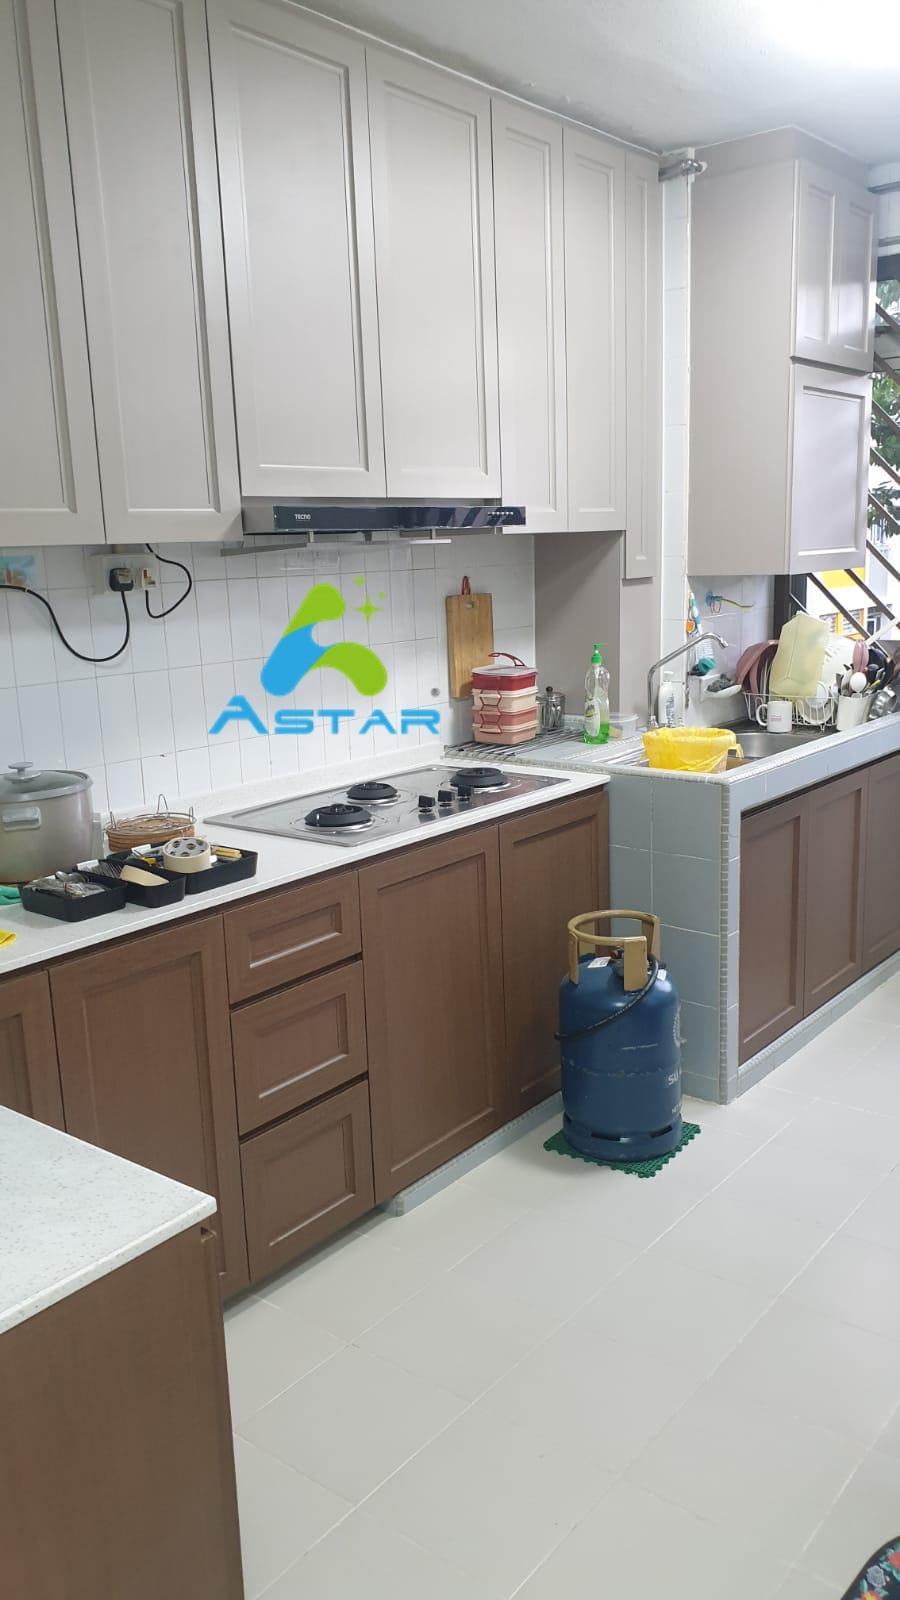 a star furnishing projects Blk 816 Yishun St 81 S 760816 2